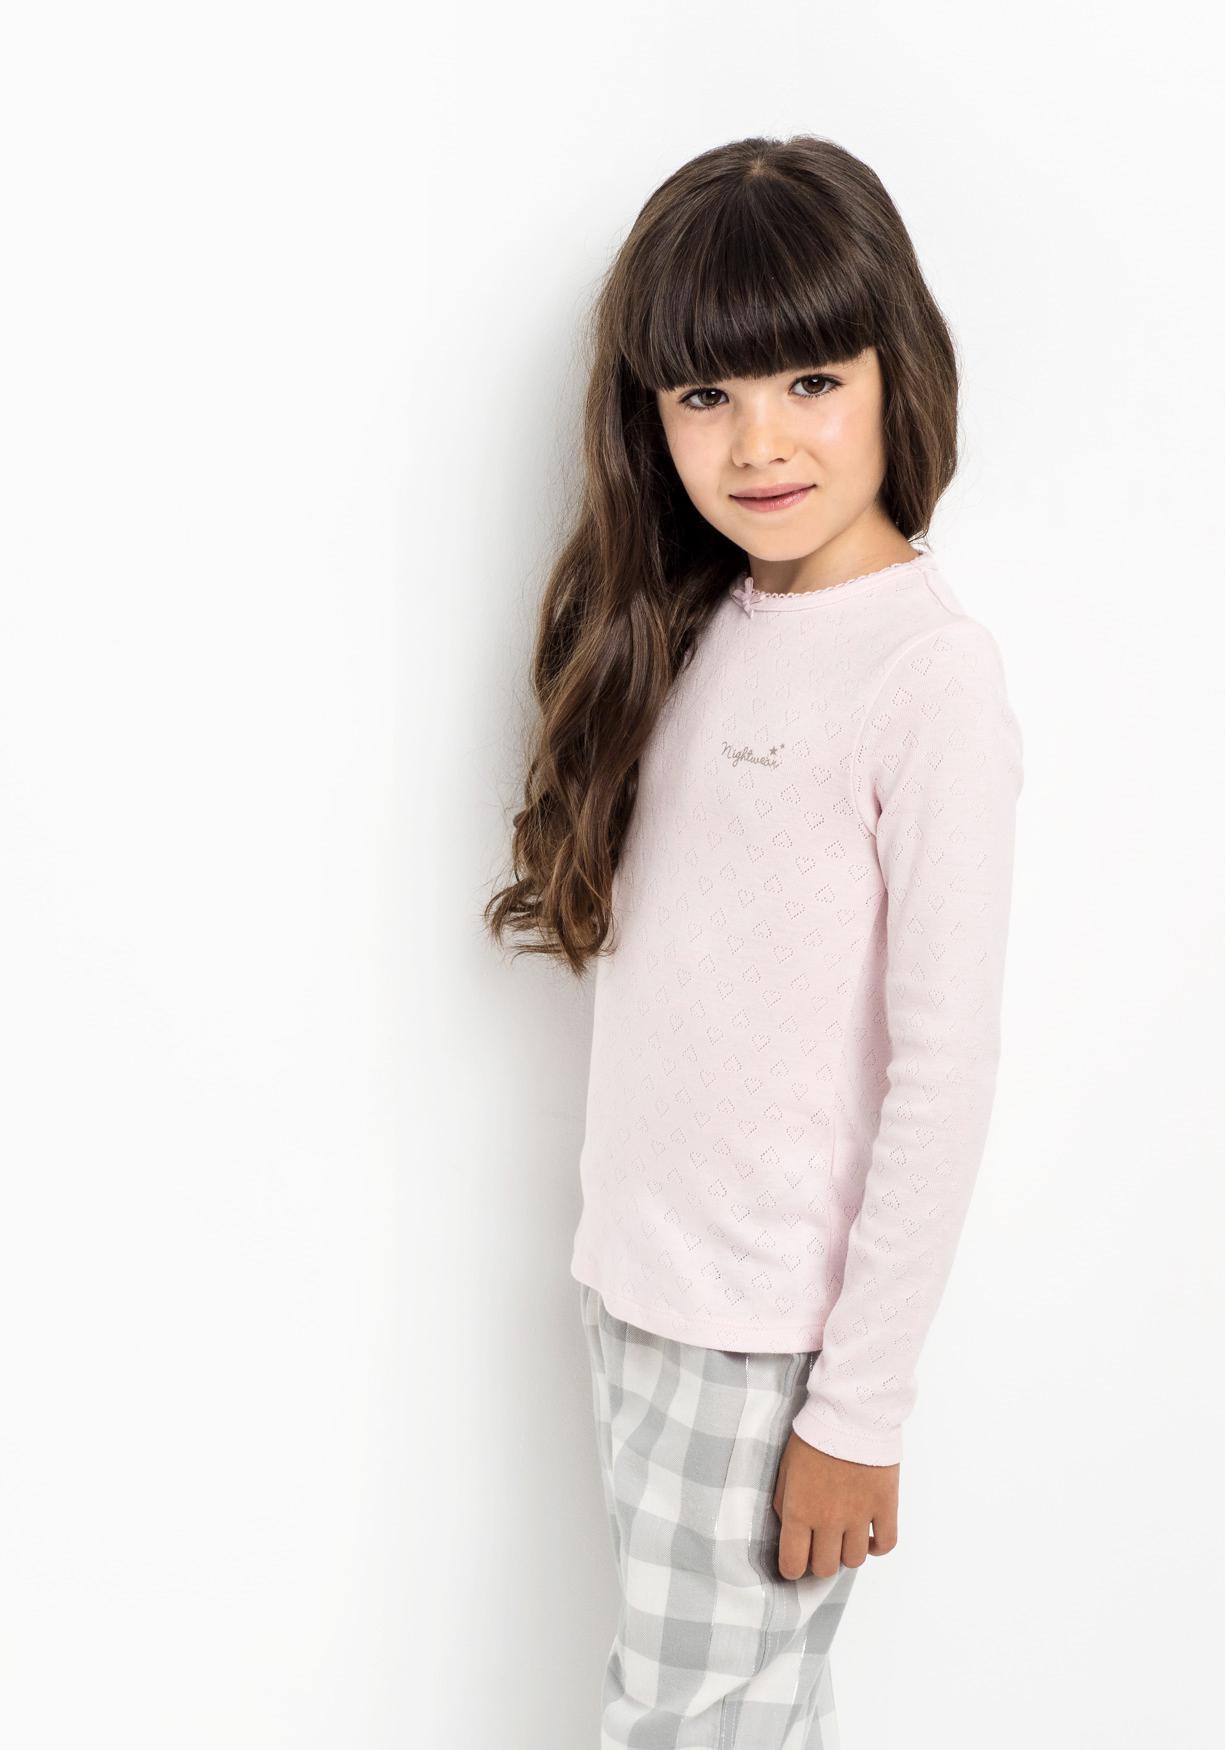 b558edee5 Comprar Pijama de dos piezas manga larga TEX (Tallas 3 a 8 ...